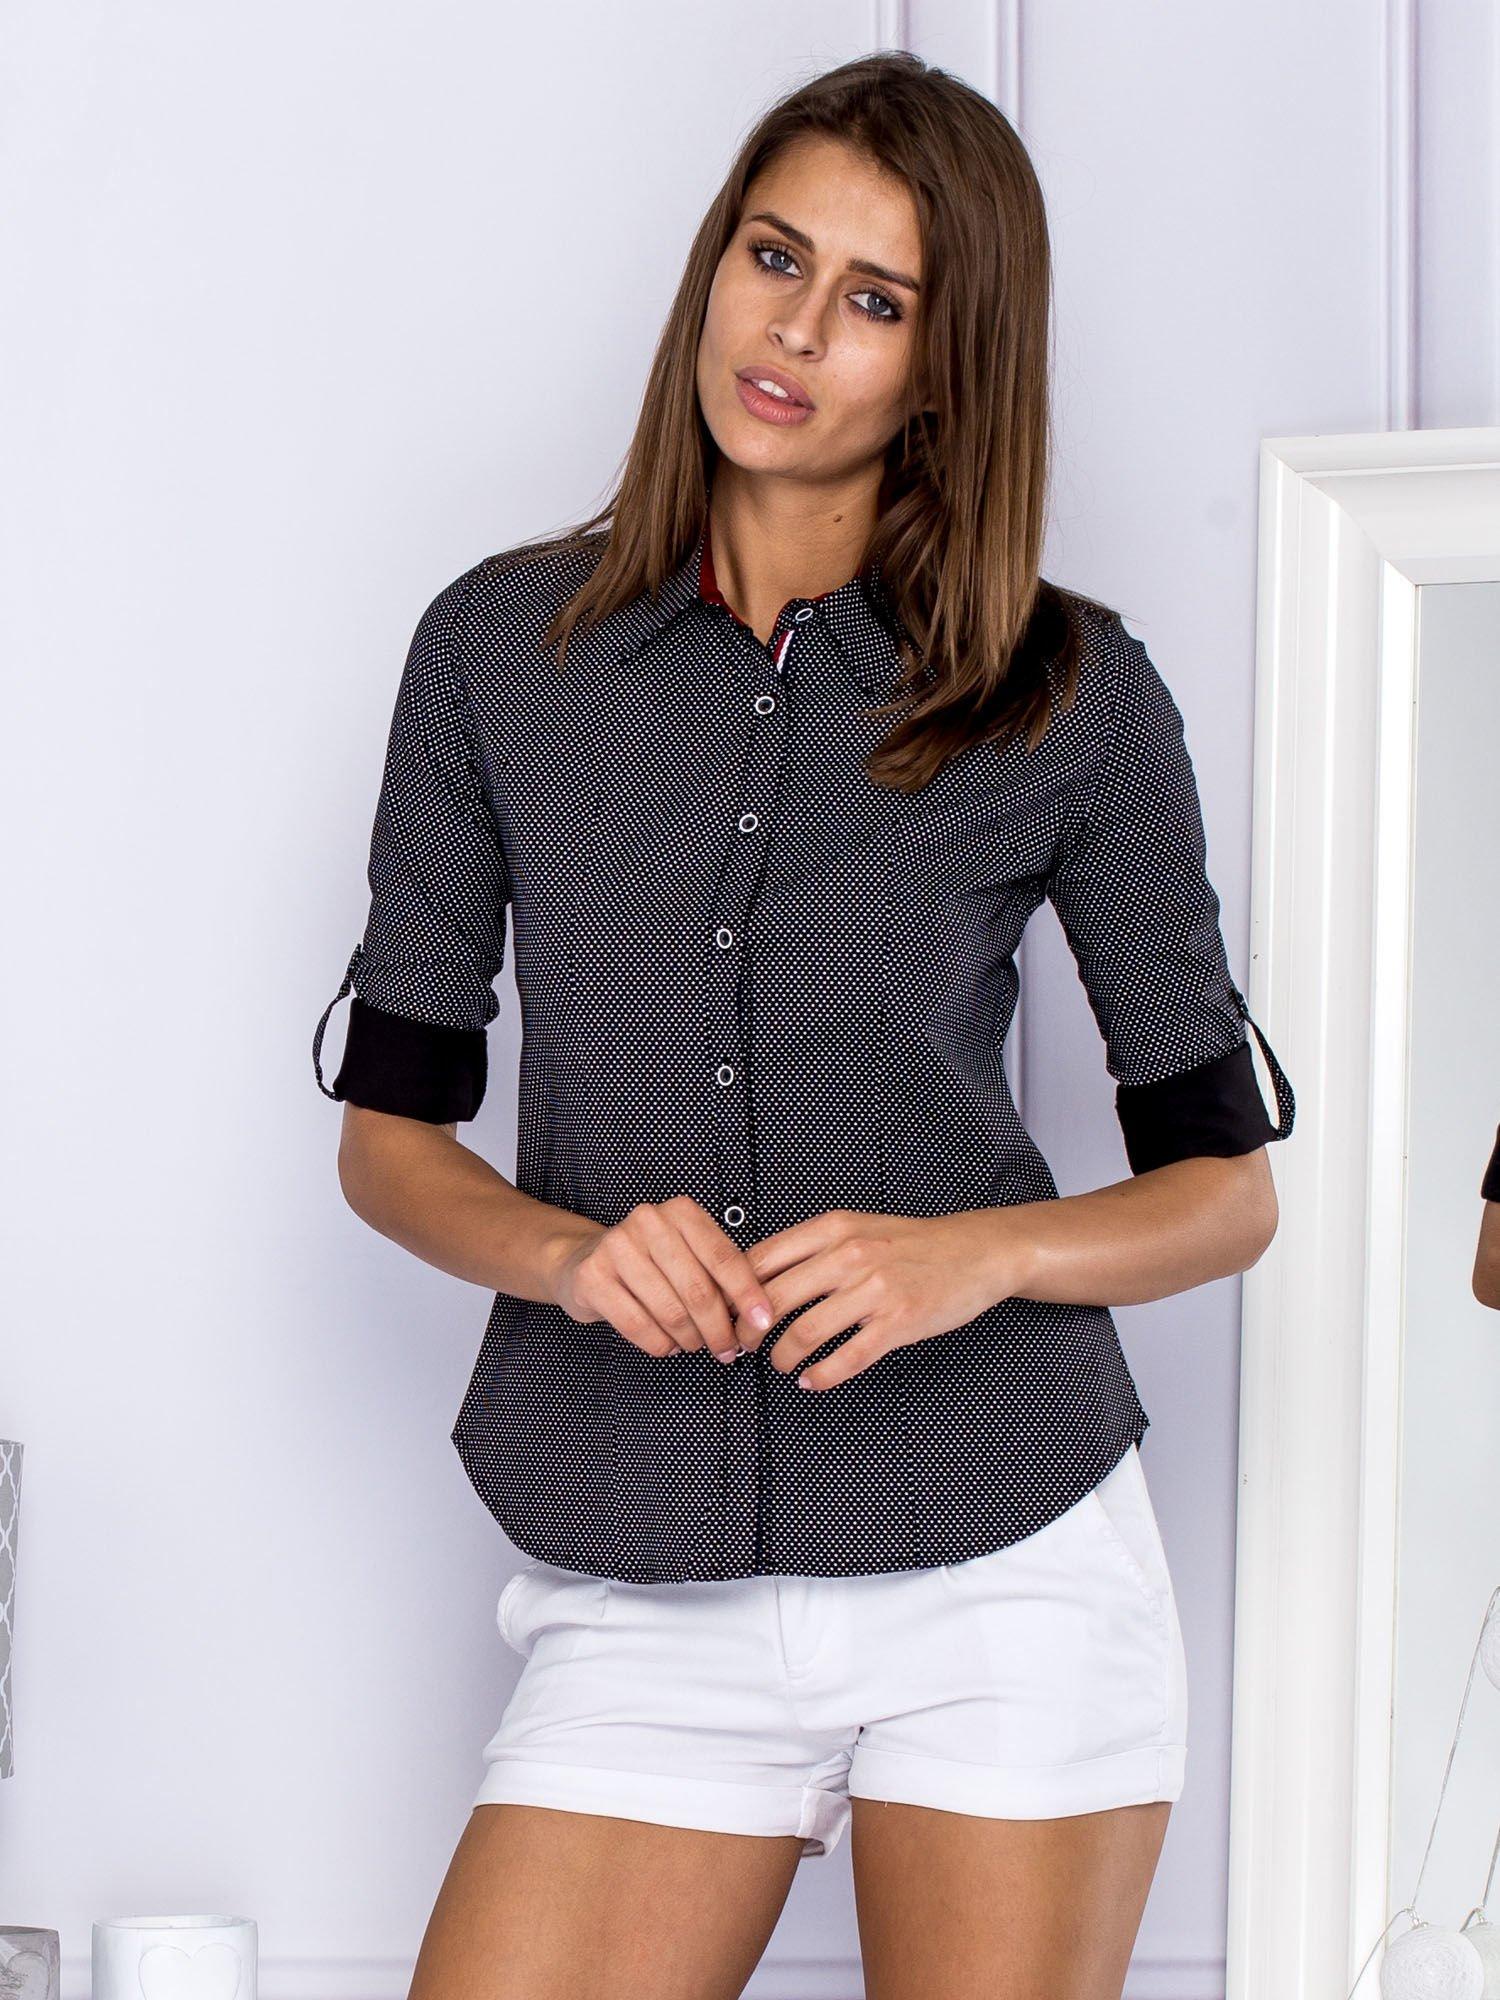 98c382f75331ec Koszula damska w groszki czarna - Koszula klasyczna - sklep eButik.pl